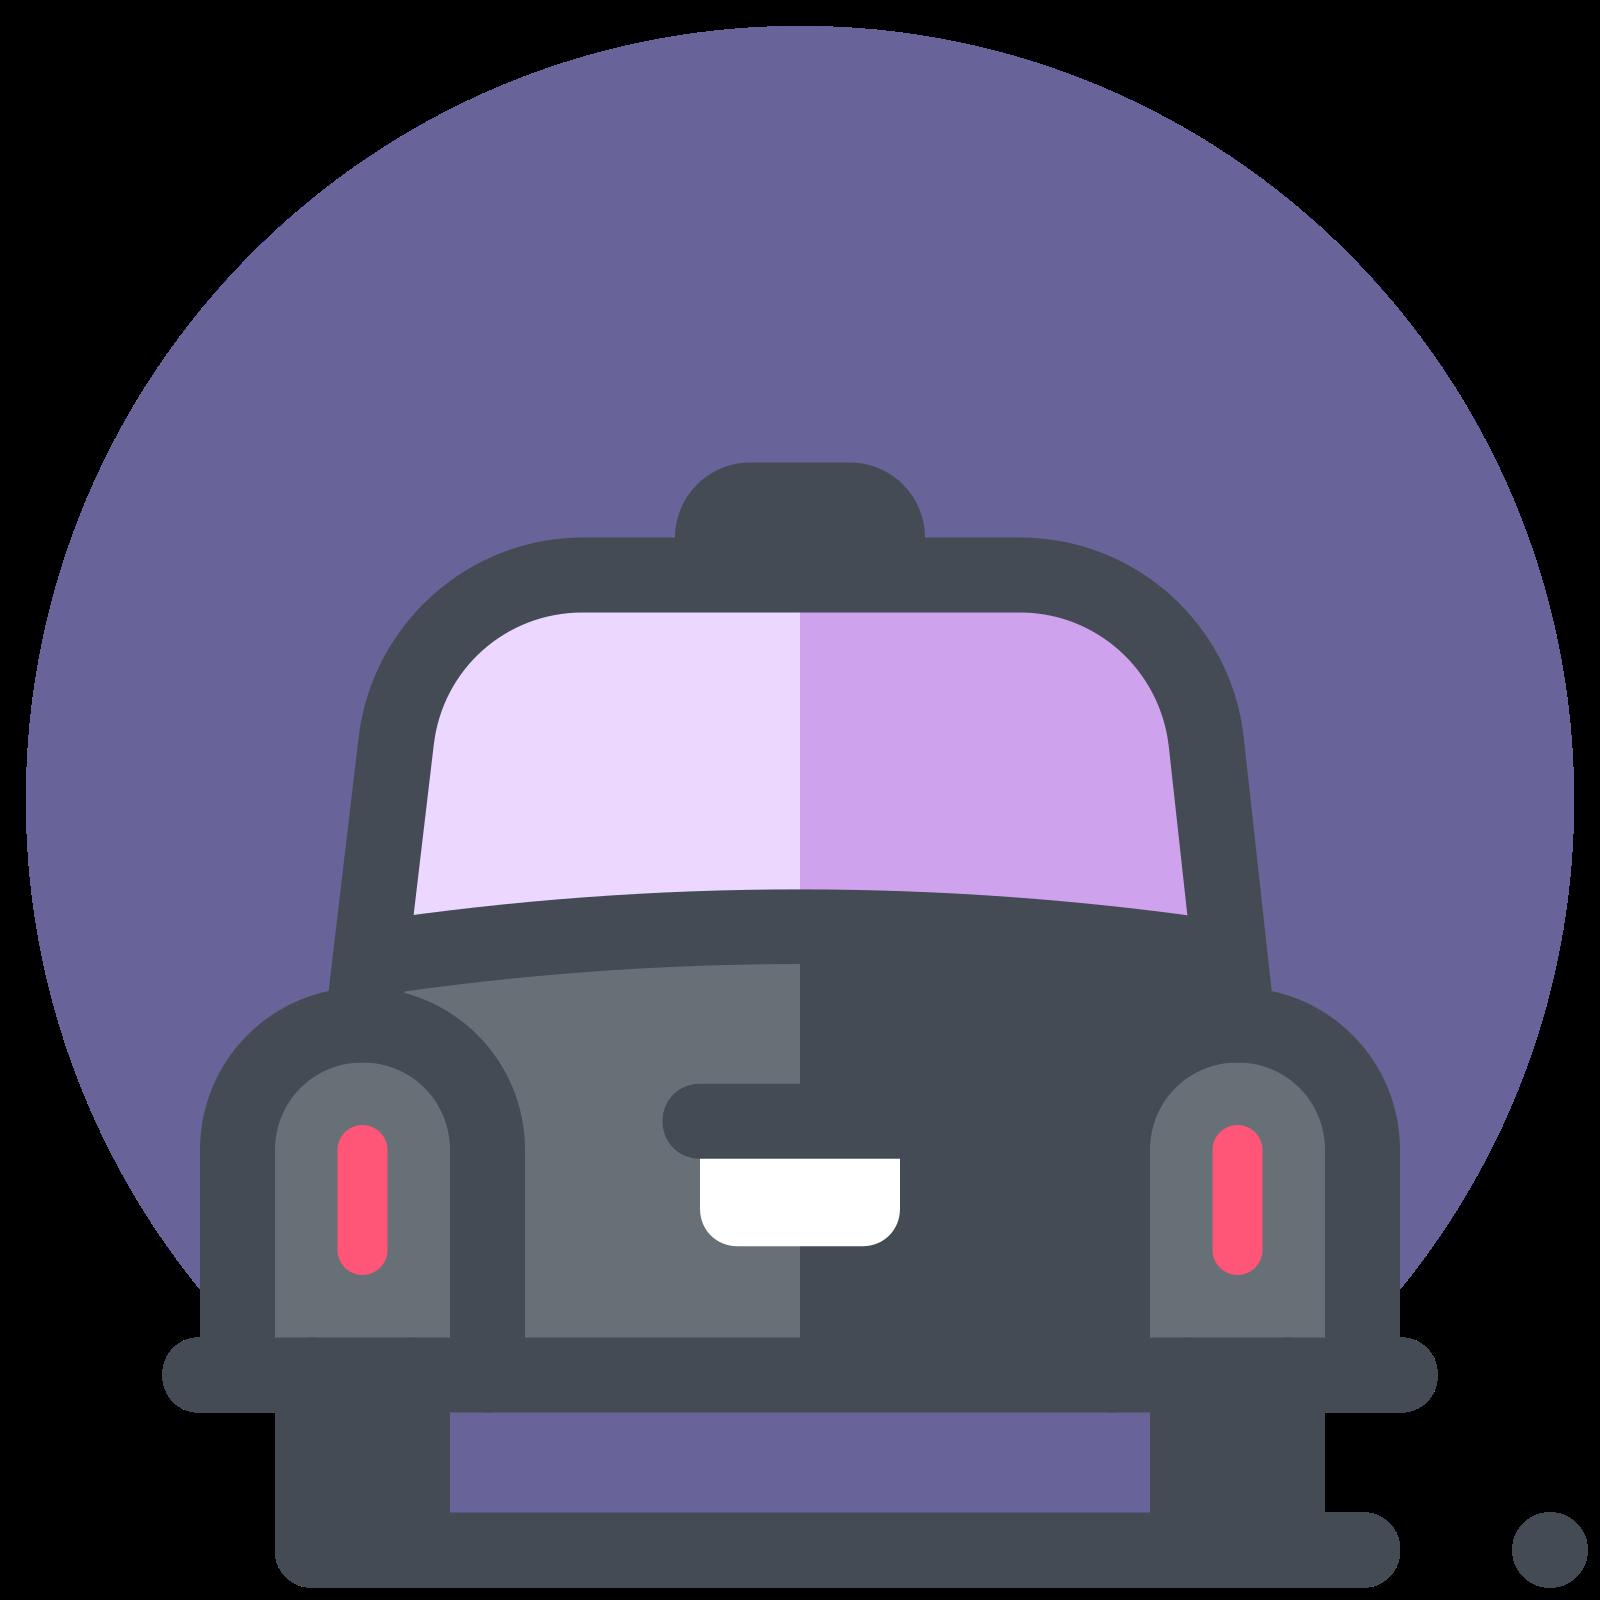 Taxi Car Cab Transport Vehicle Transport Services Zastosowanie 38 icon